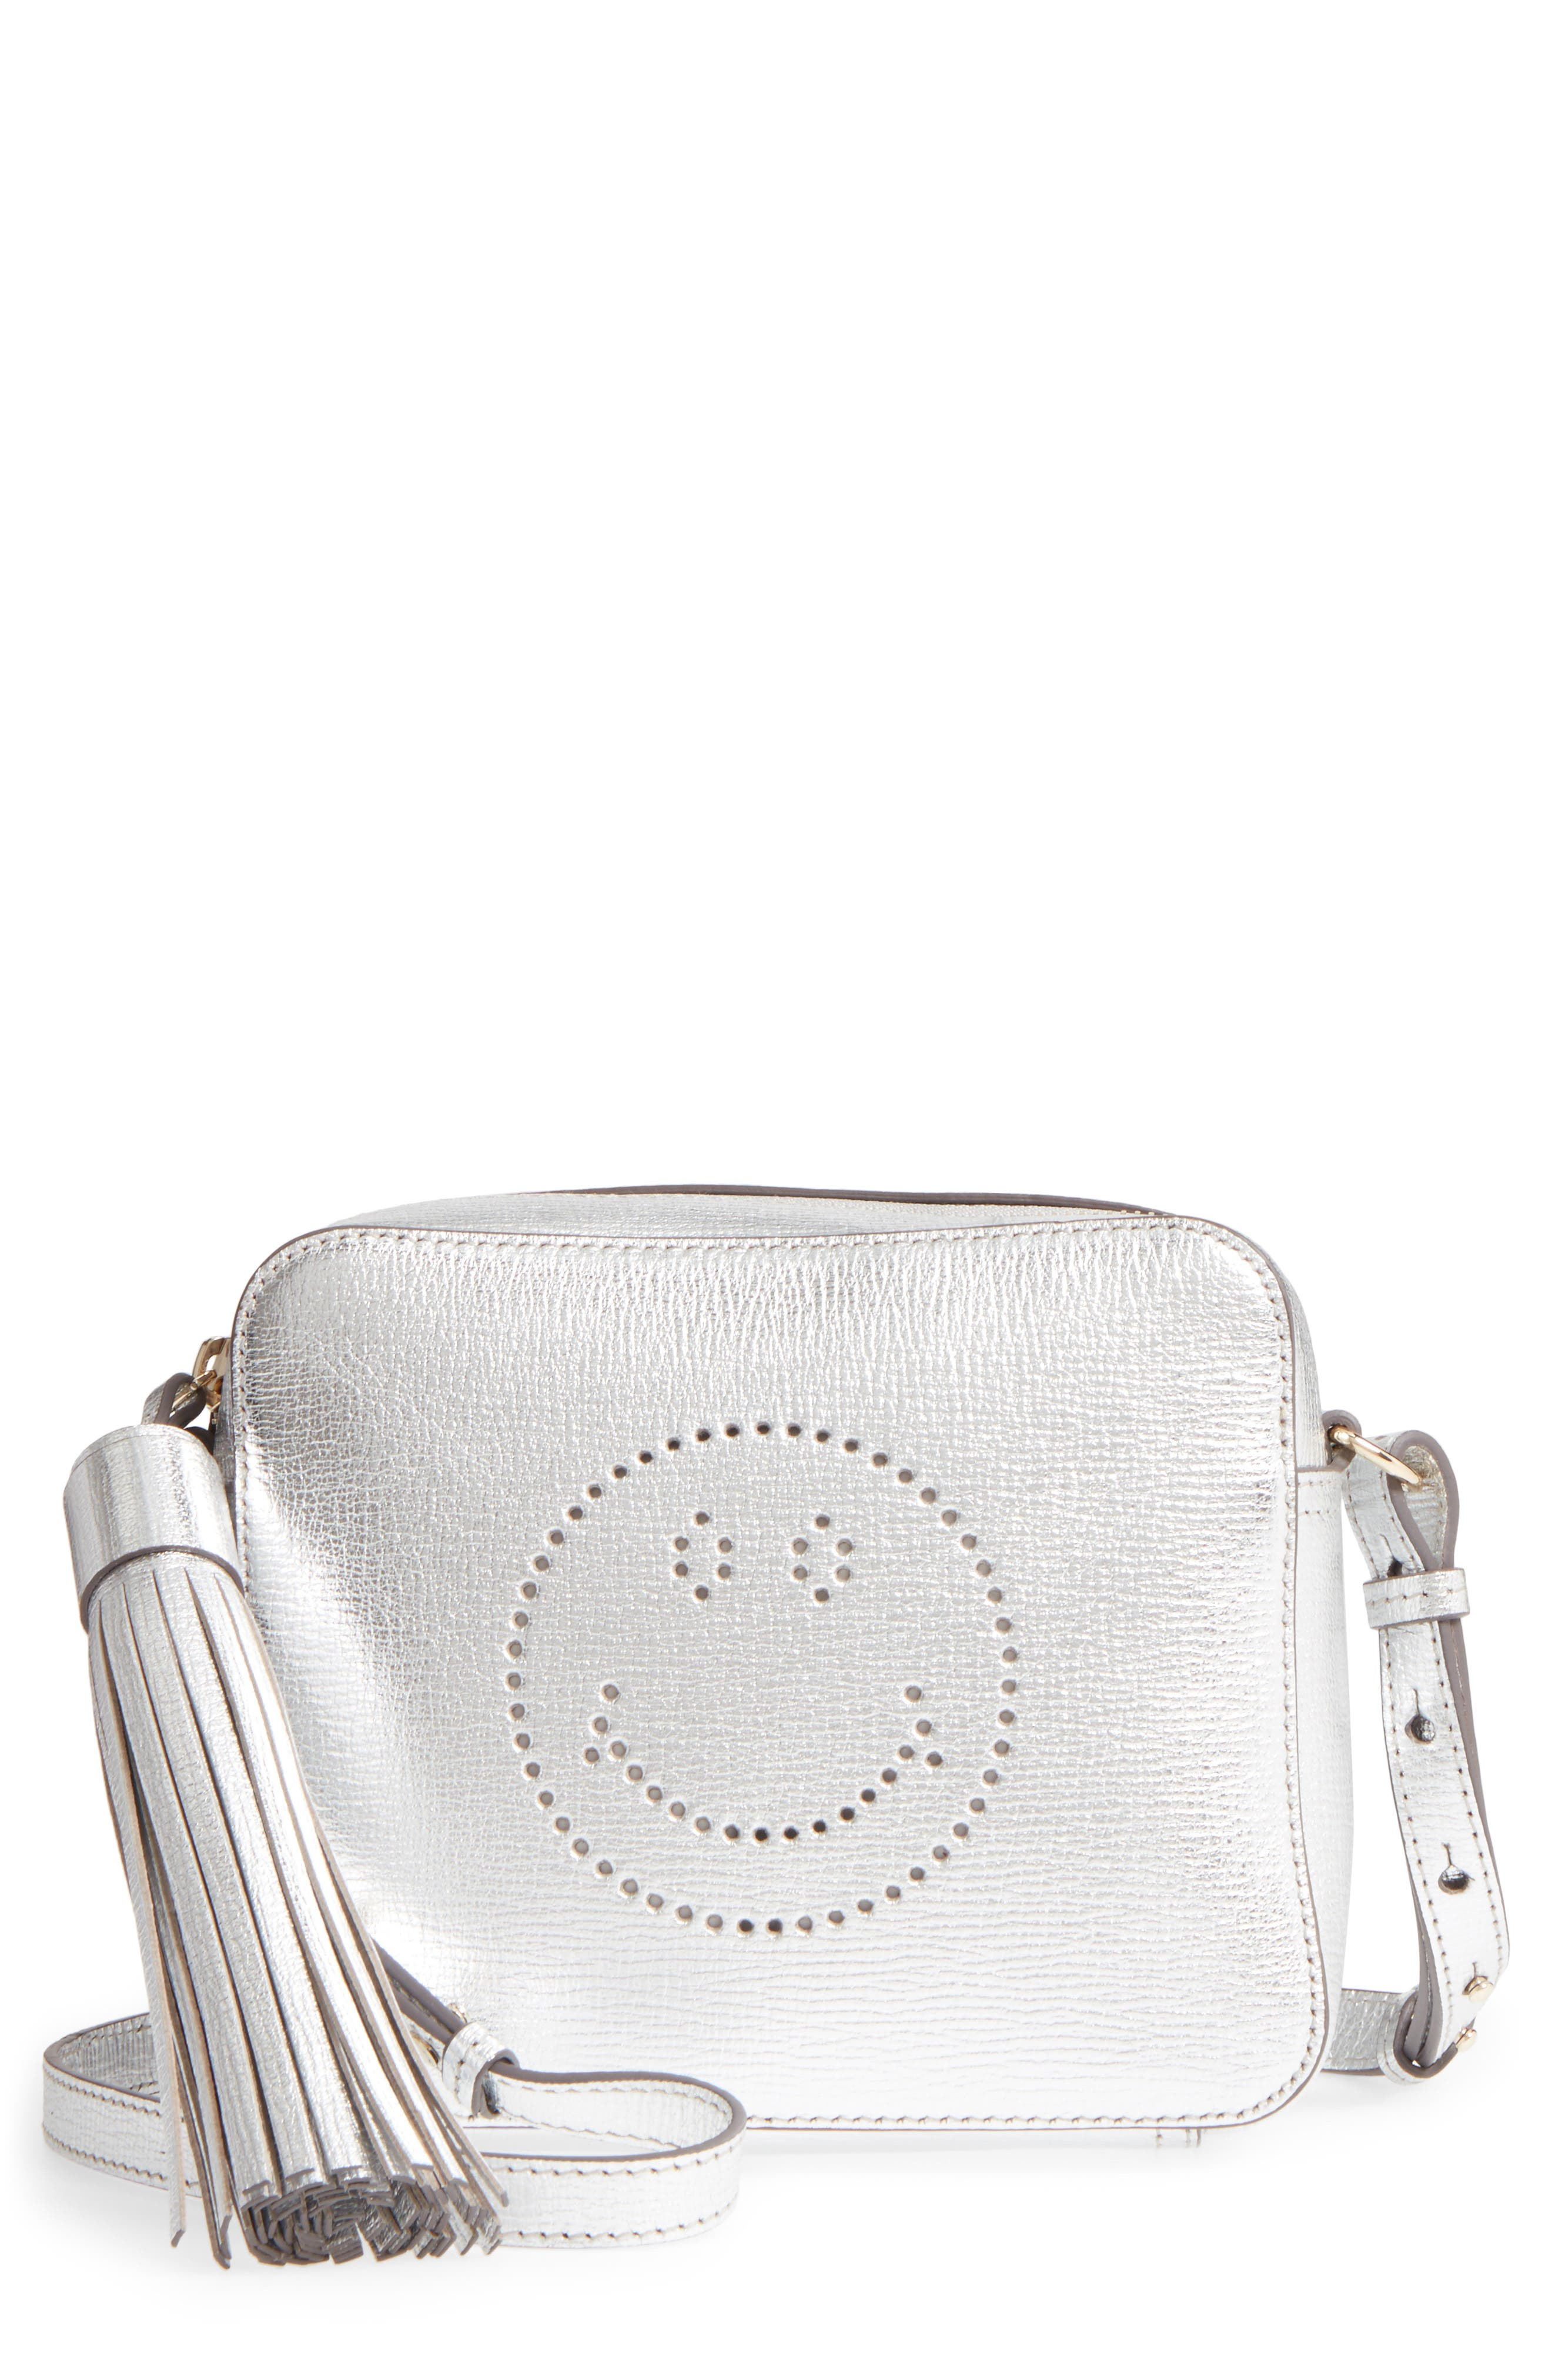 Smiley Metallic Leather Crossbody Bag,                         Main,                         color, SILVER